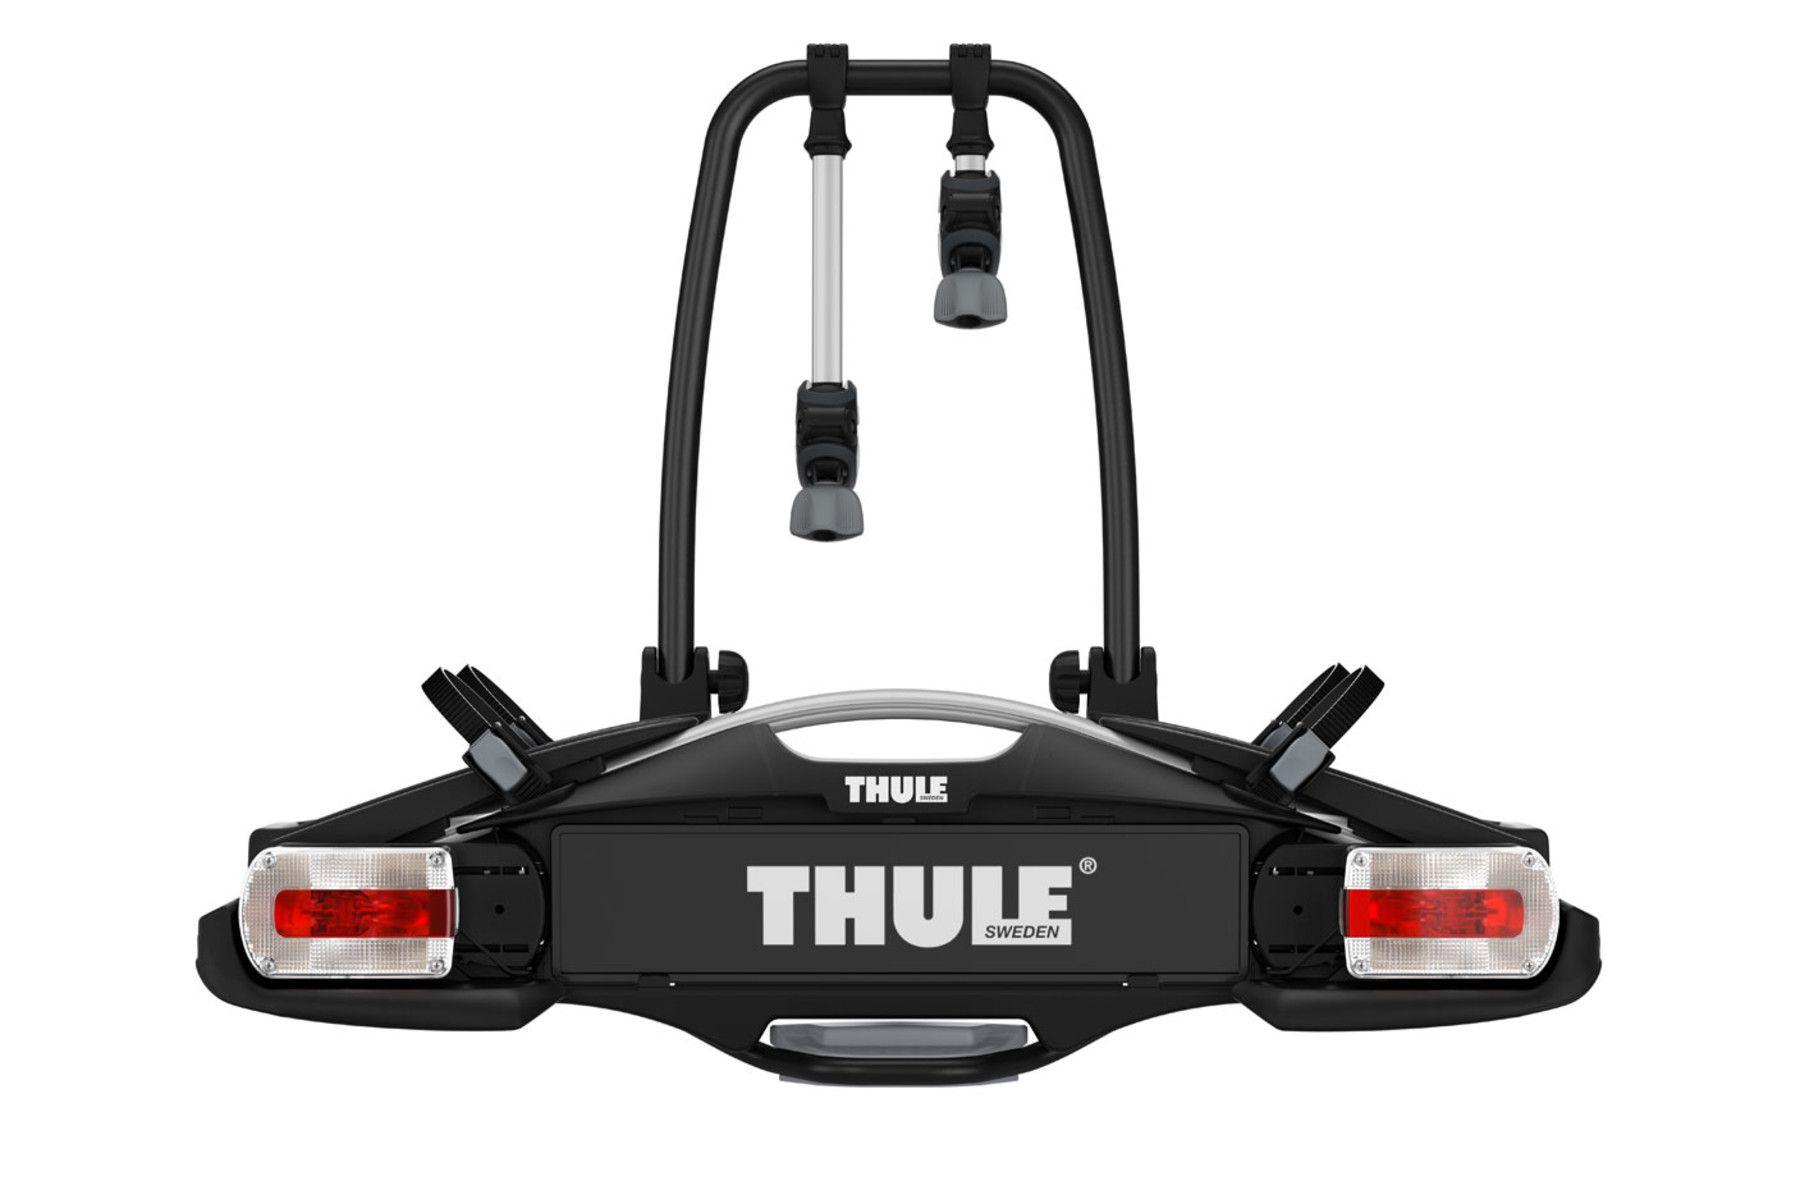 Transbike THULE VeloCompact 925 para engate de reboque 2 Bikes